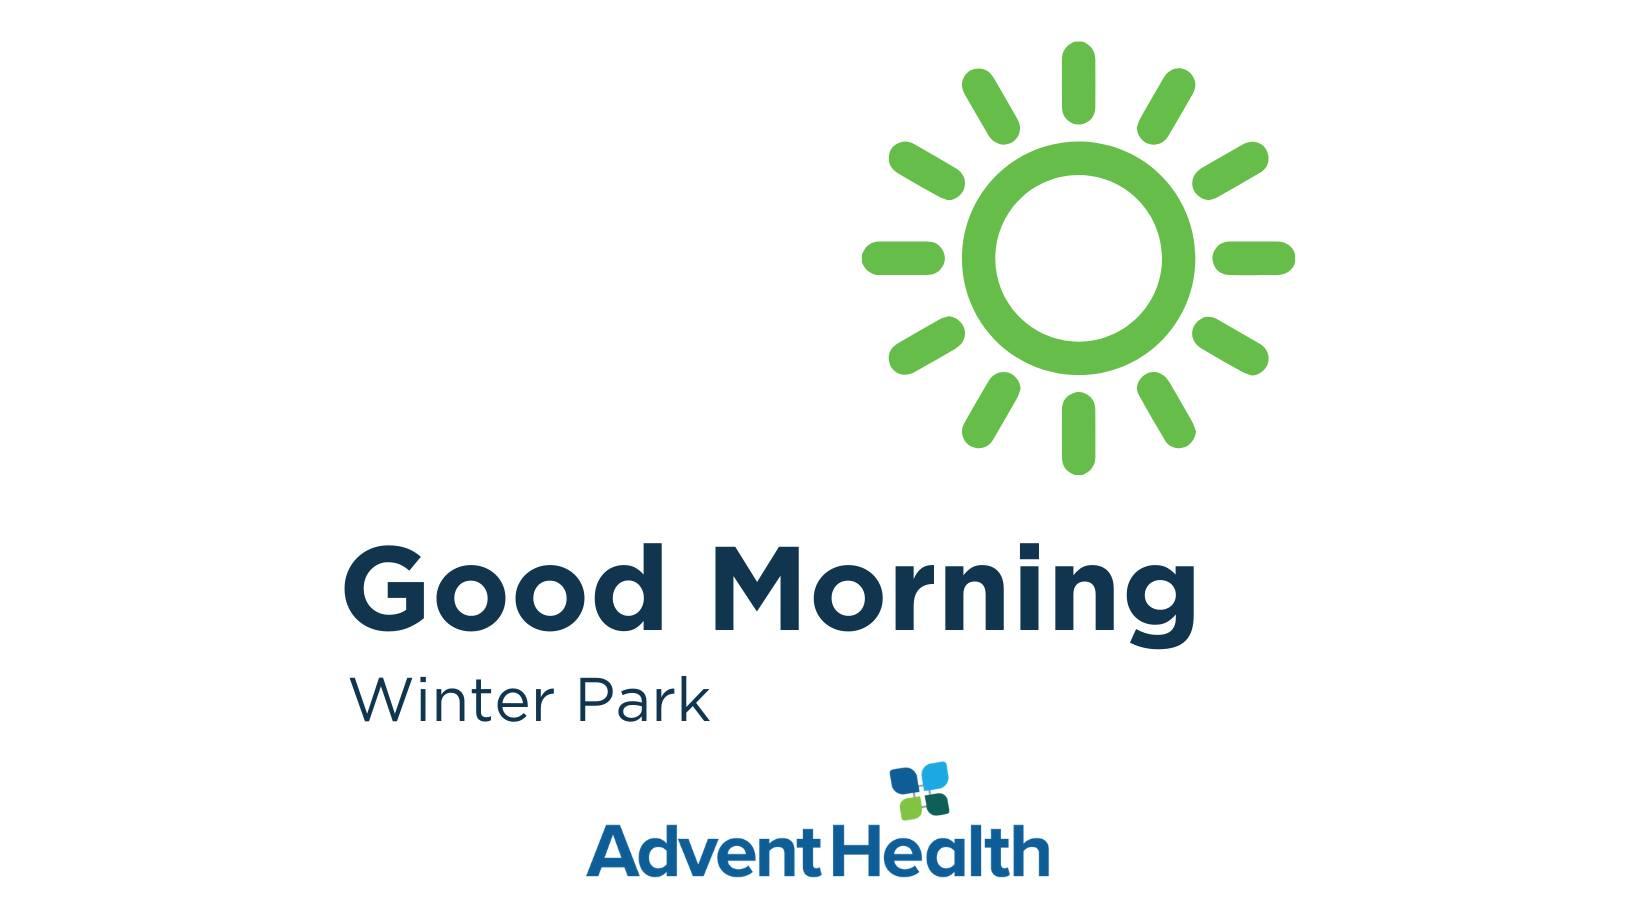 good morning winter park decorative graphic